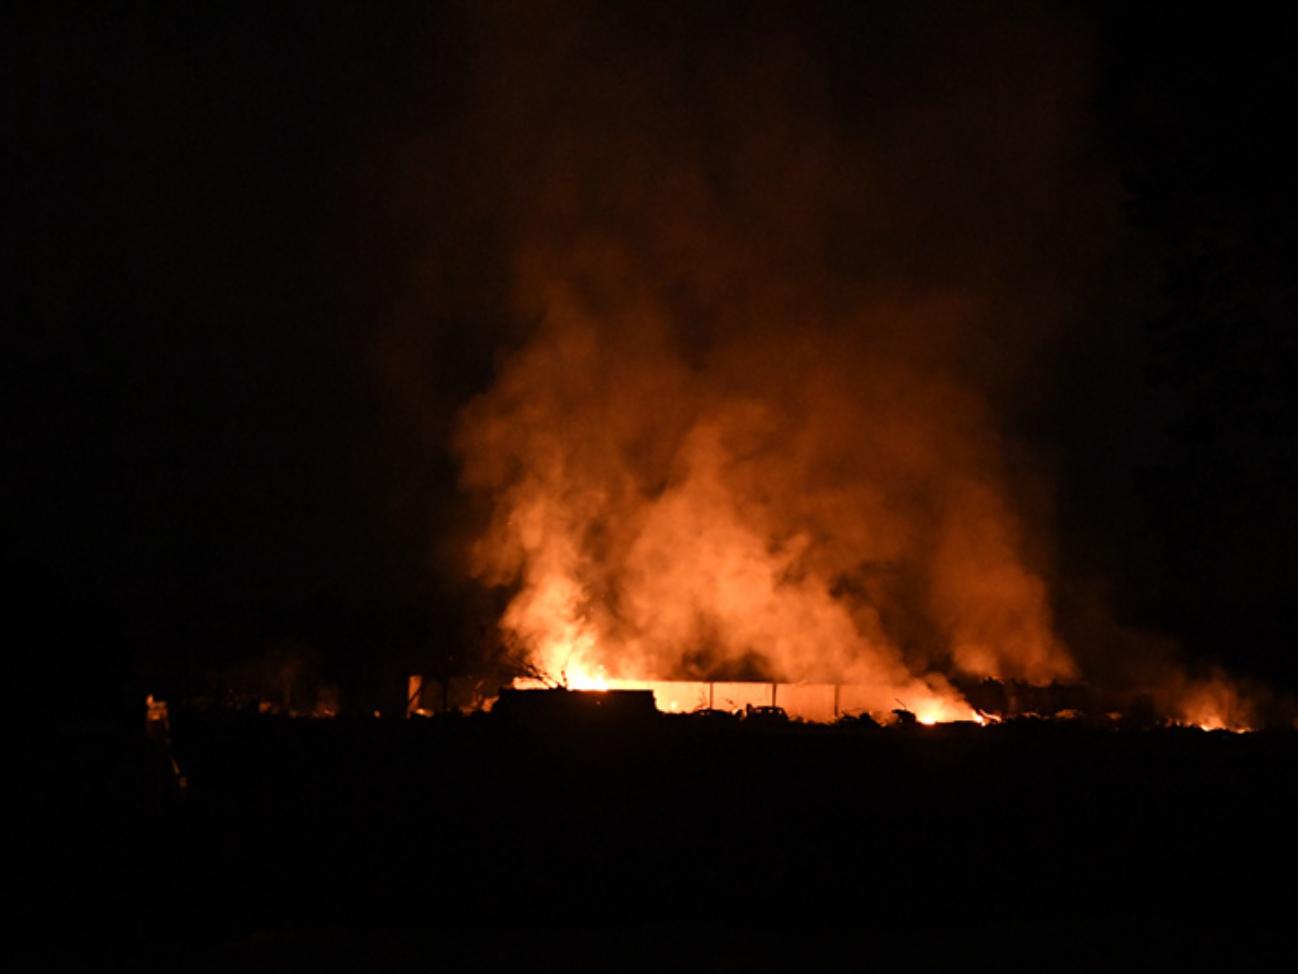 Fireworks plant blast injures 6 in Southwest China